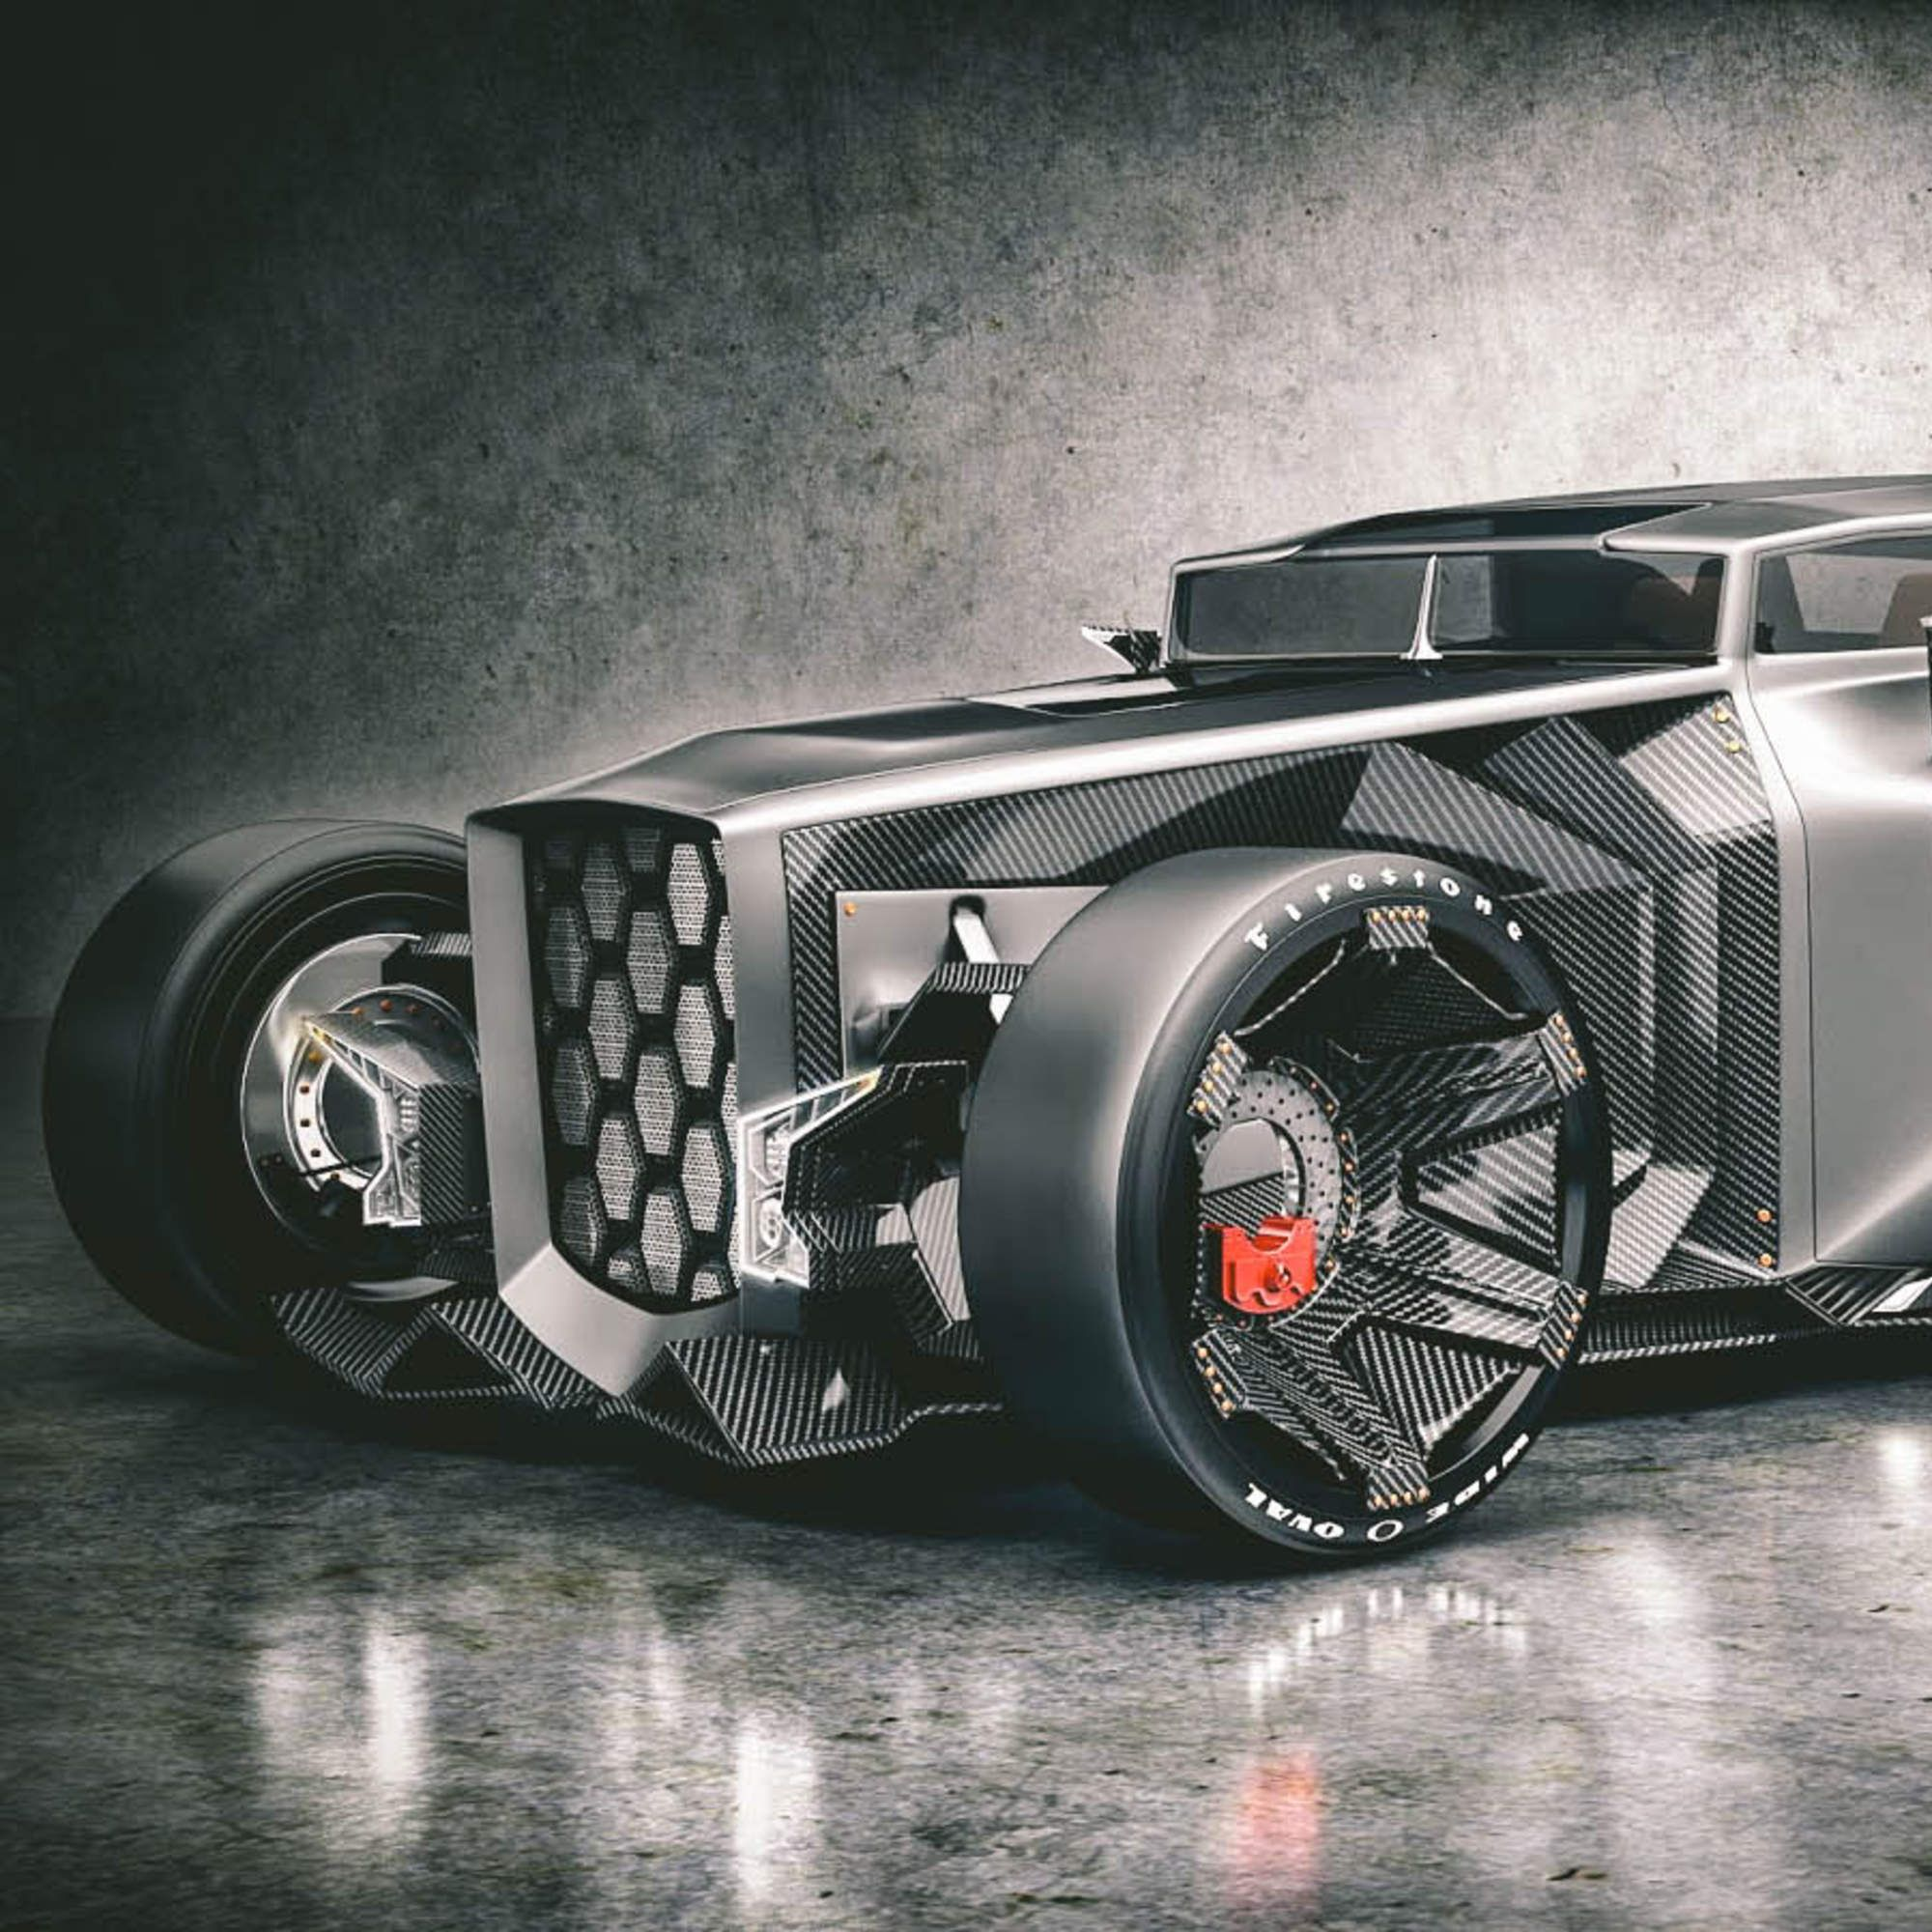 Batman S Hot Rod Sports Car Wallpaper Top Luxury Cars Car Wallpapers